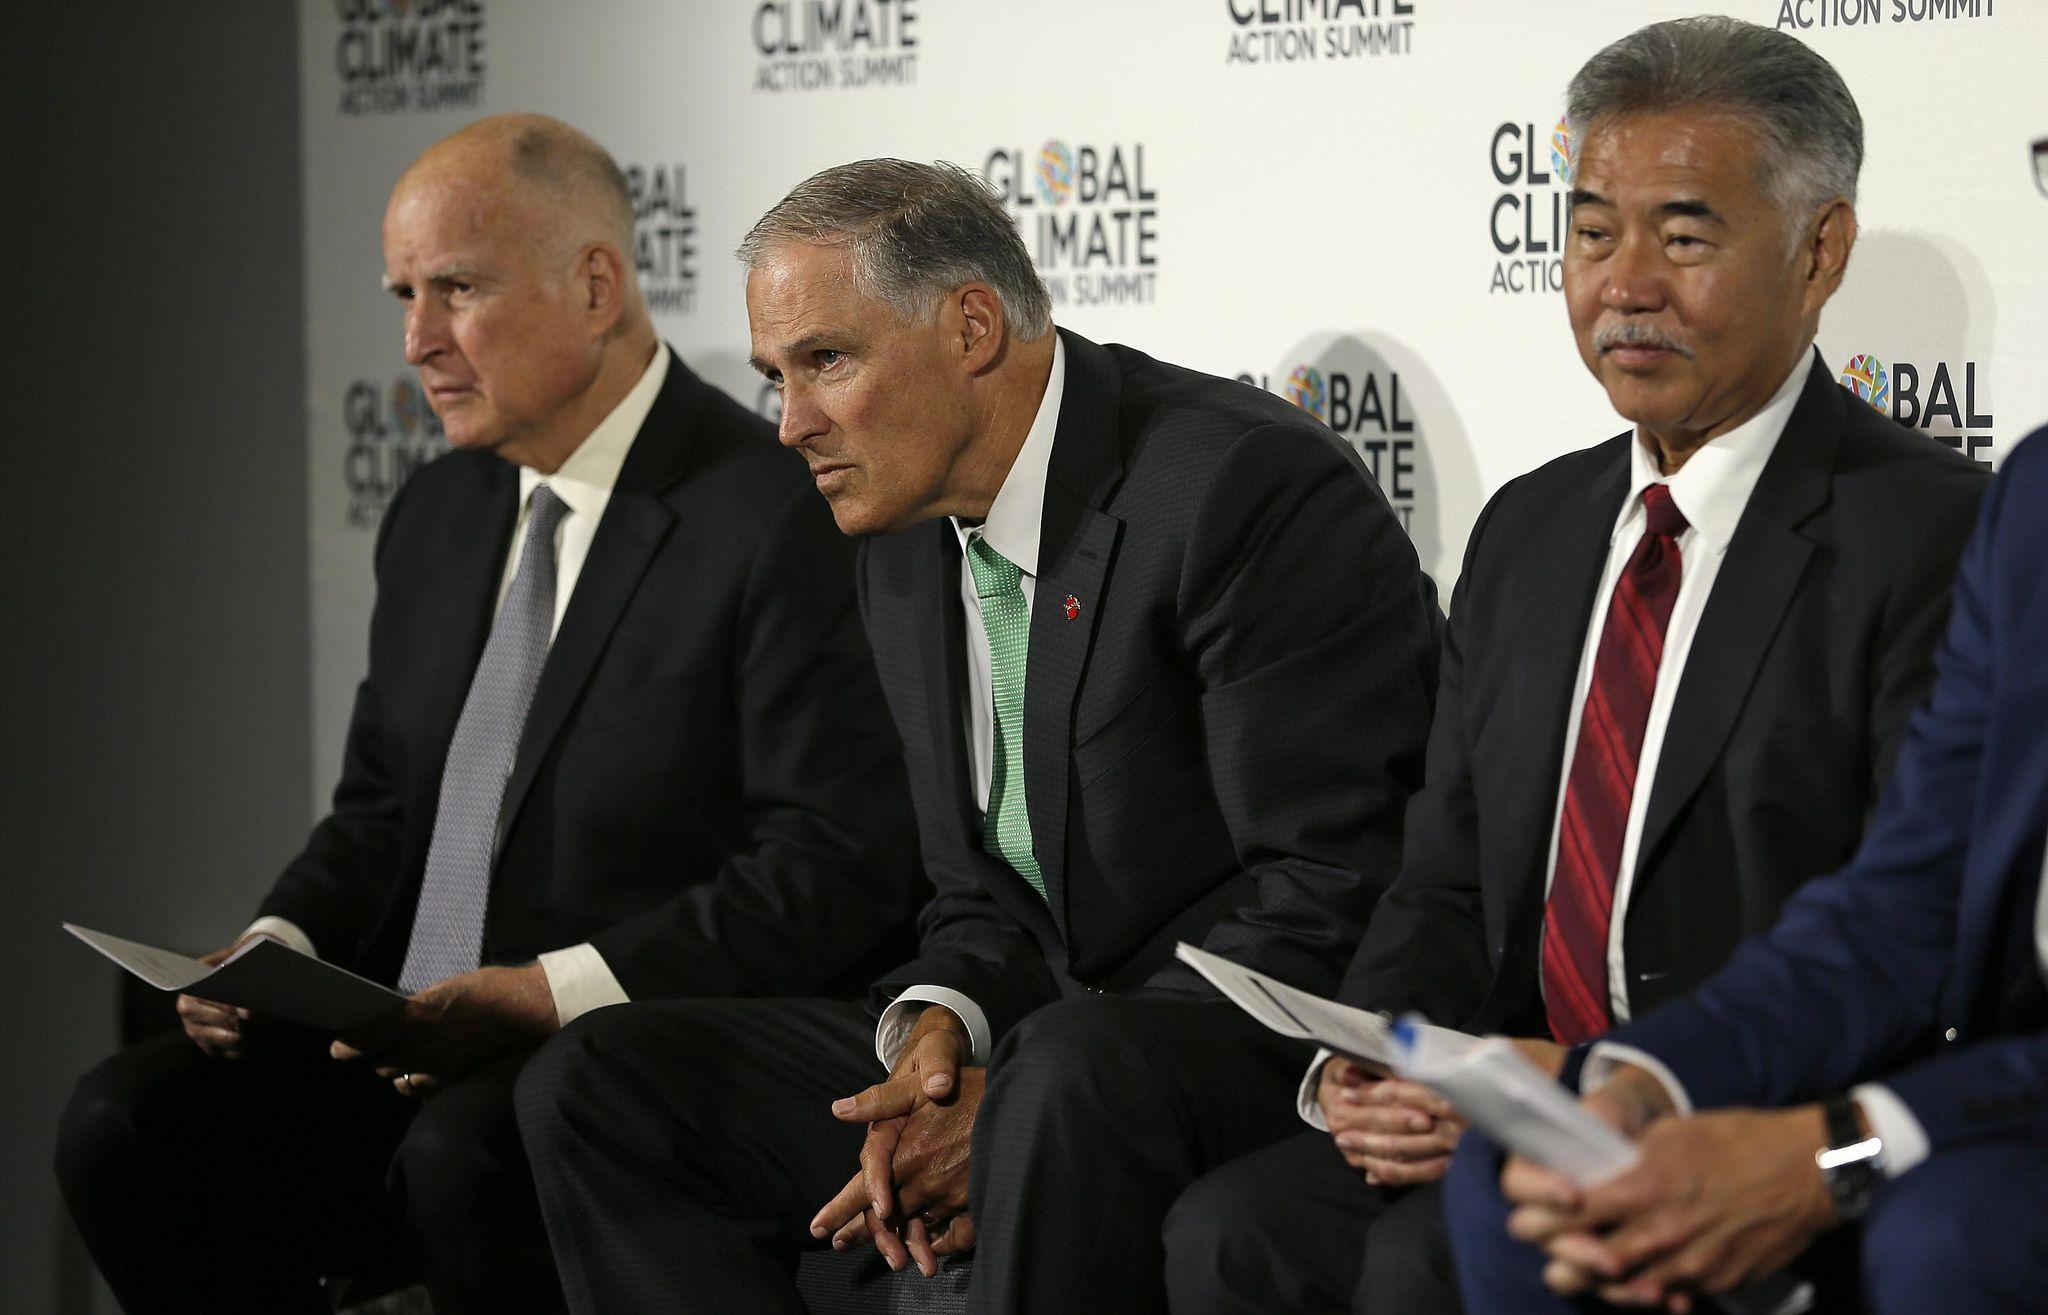 The Latest: Al Gore says US can rejoin Paris Agreement - Washington Times